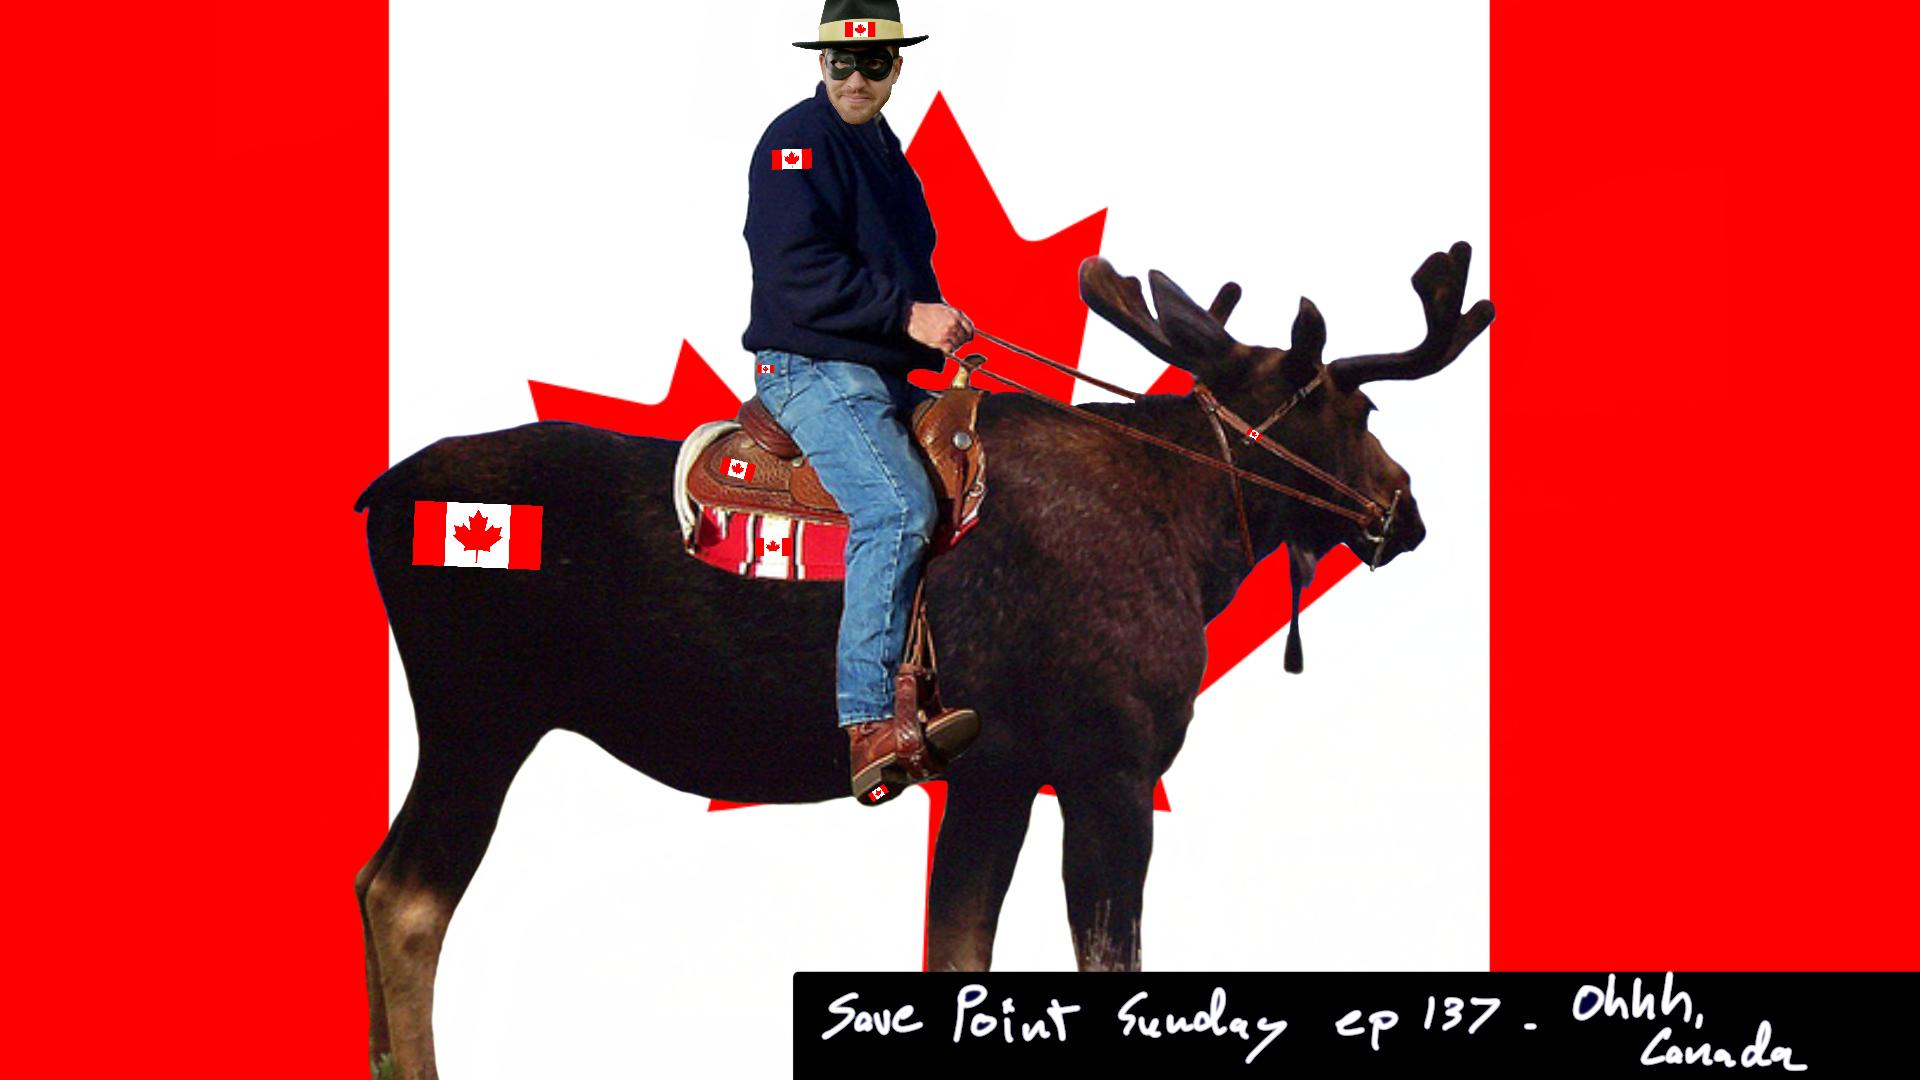 Episode 137: Ohhh, Canada